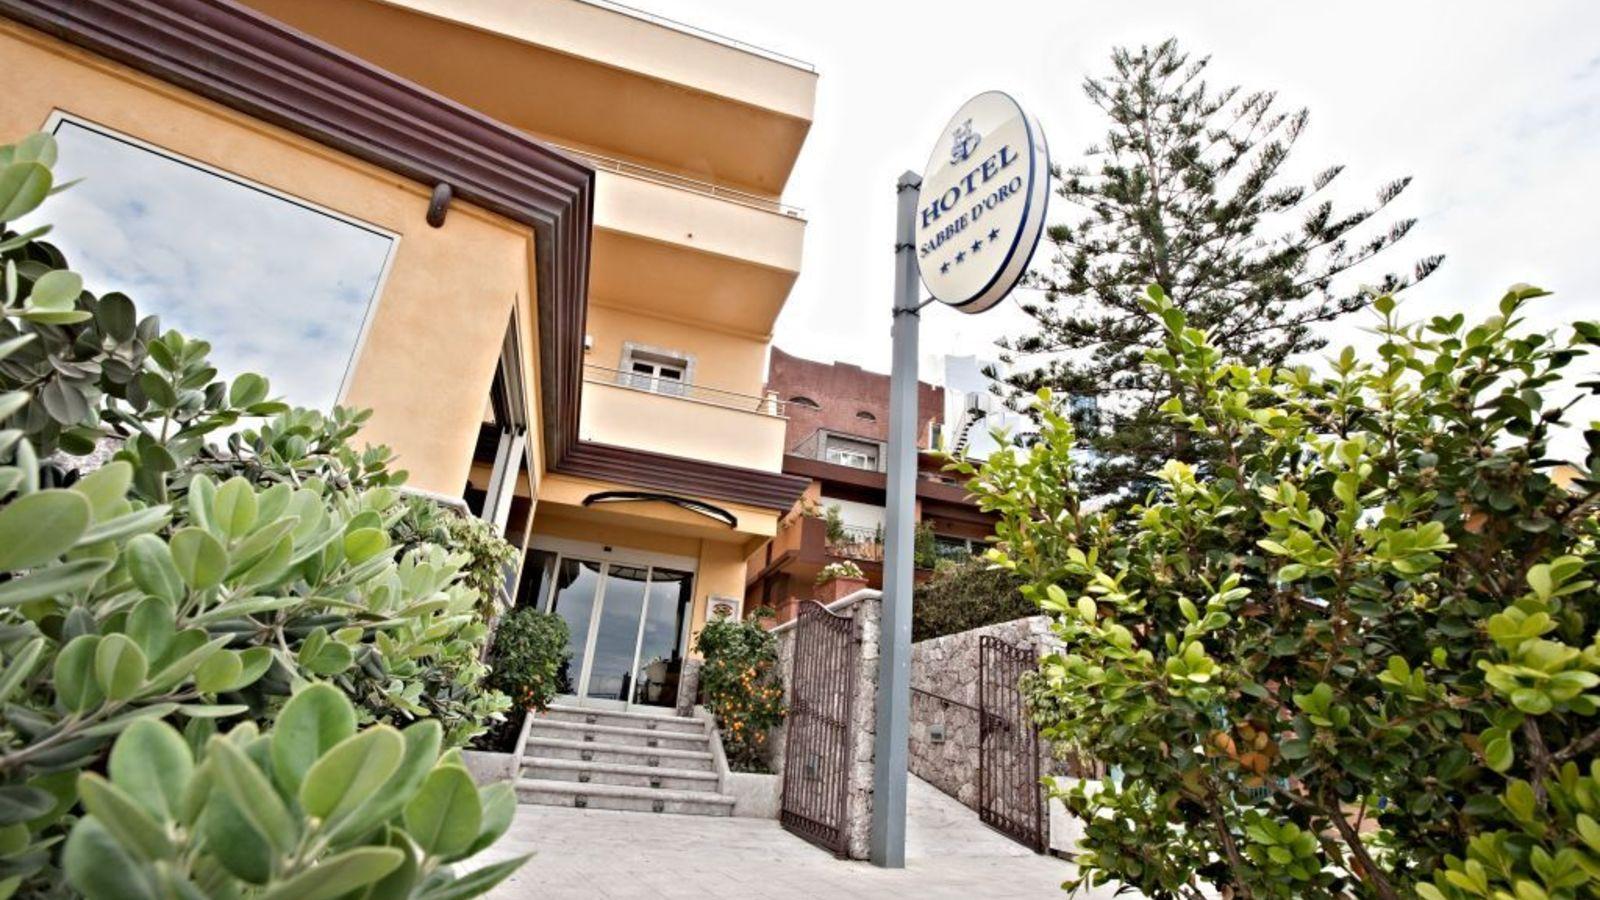 Hotel sabbie d oro bandb giardini naxos - Hotel la riva giardini naxos ...